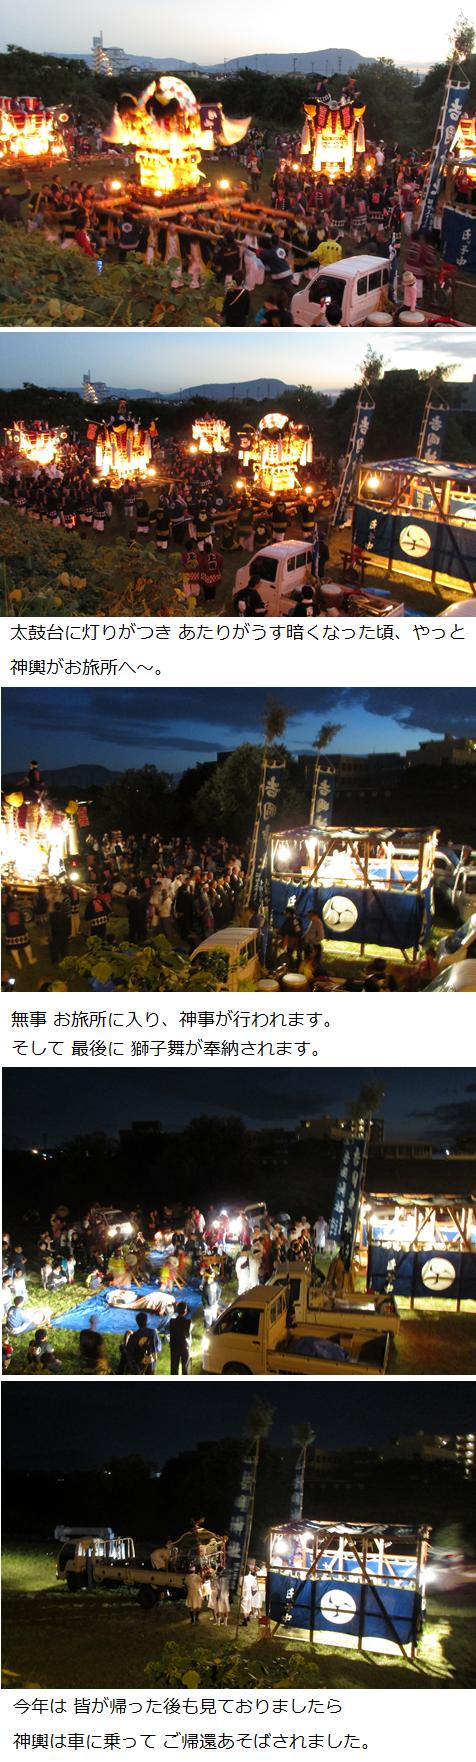 a20161010吉岡神社秋祭り2